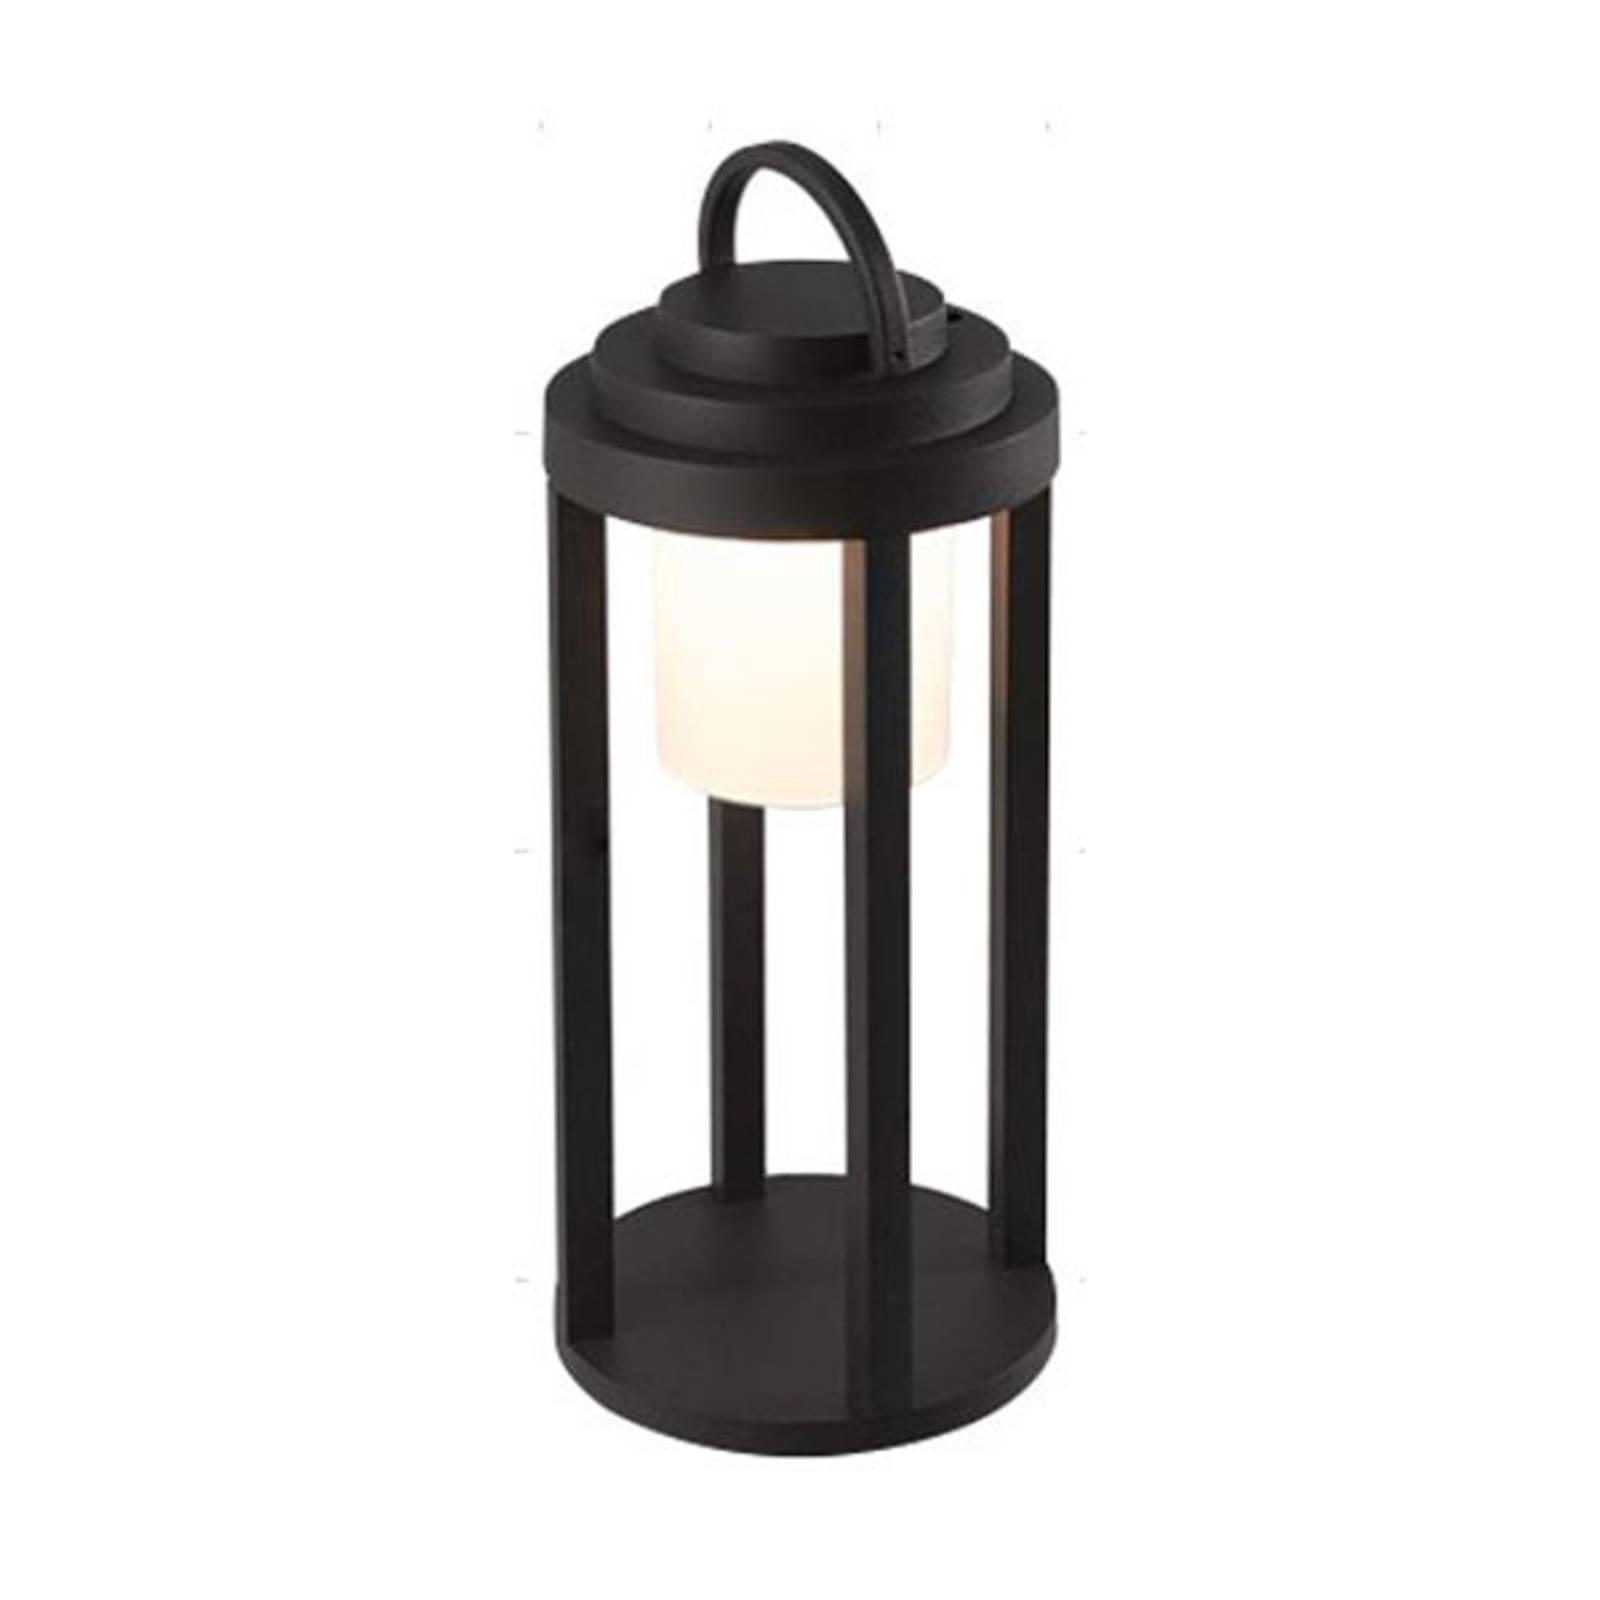 LED-ulkovalaisin Kalimnos, musta, akku, 35 cm